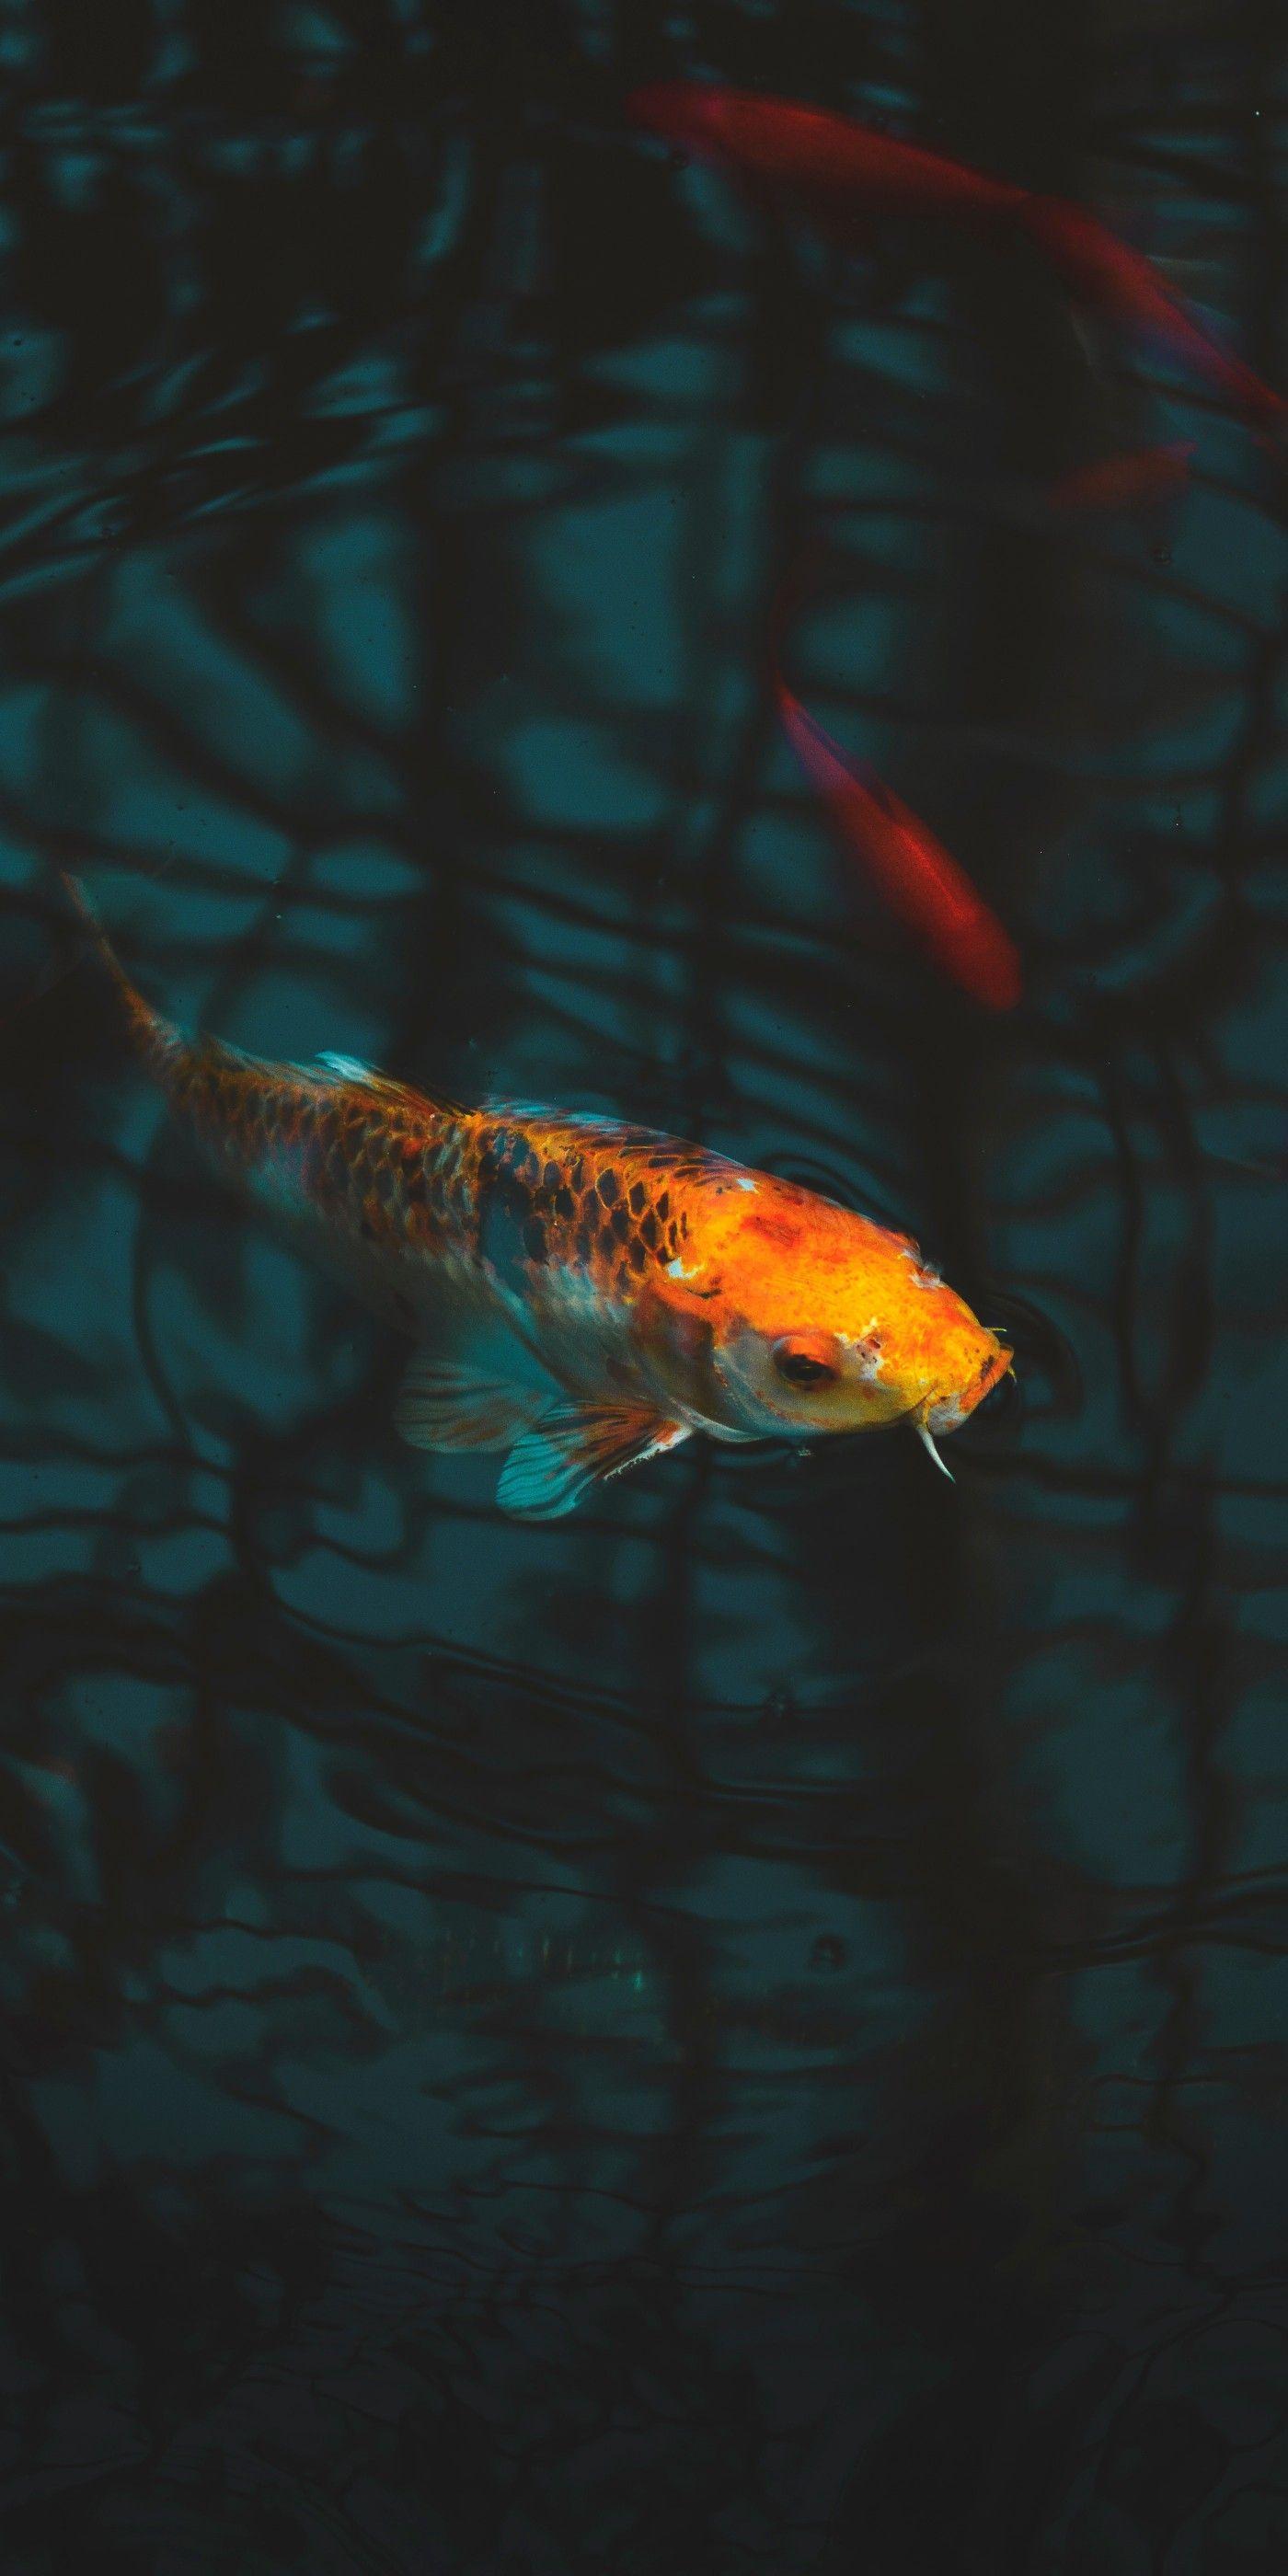 Pin By Iyan Sofyan On Animals Pictures Koi Fish Colors Fish Wallpaper Koi Fish